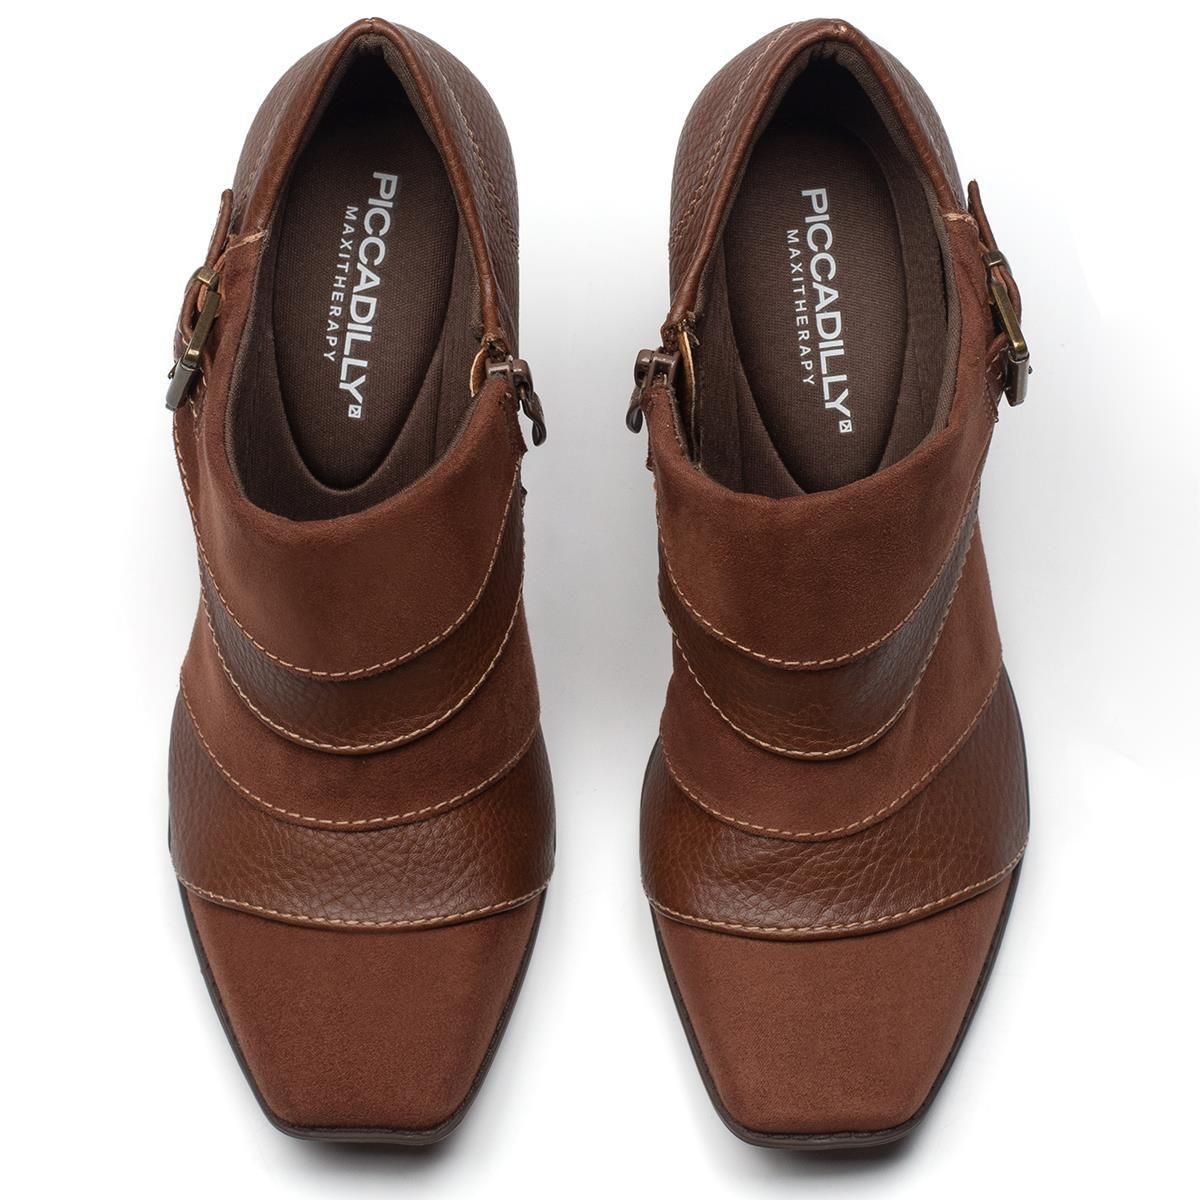 Bota Piccadilly Cano Curto Salto Grosso Fivela Ankle Boot 372004 Feminina